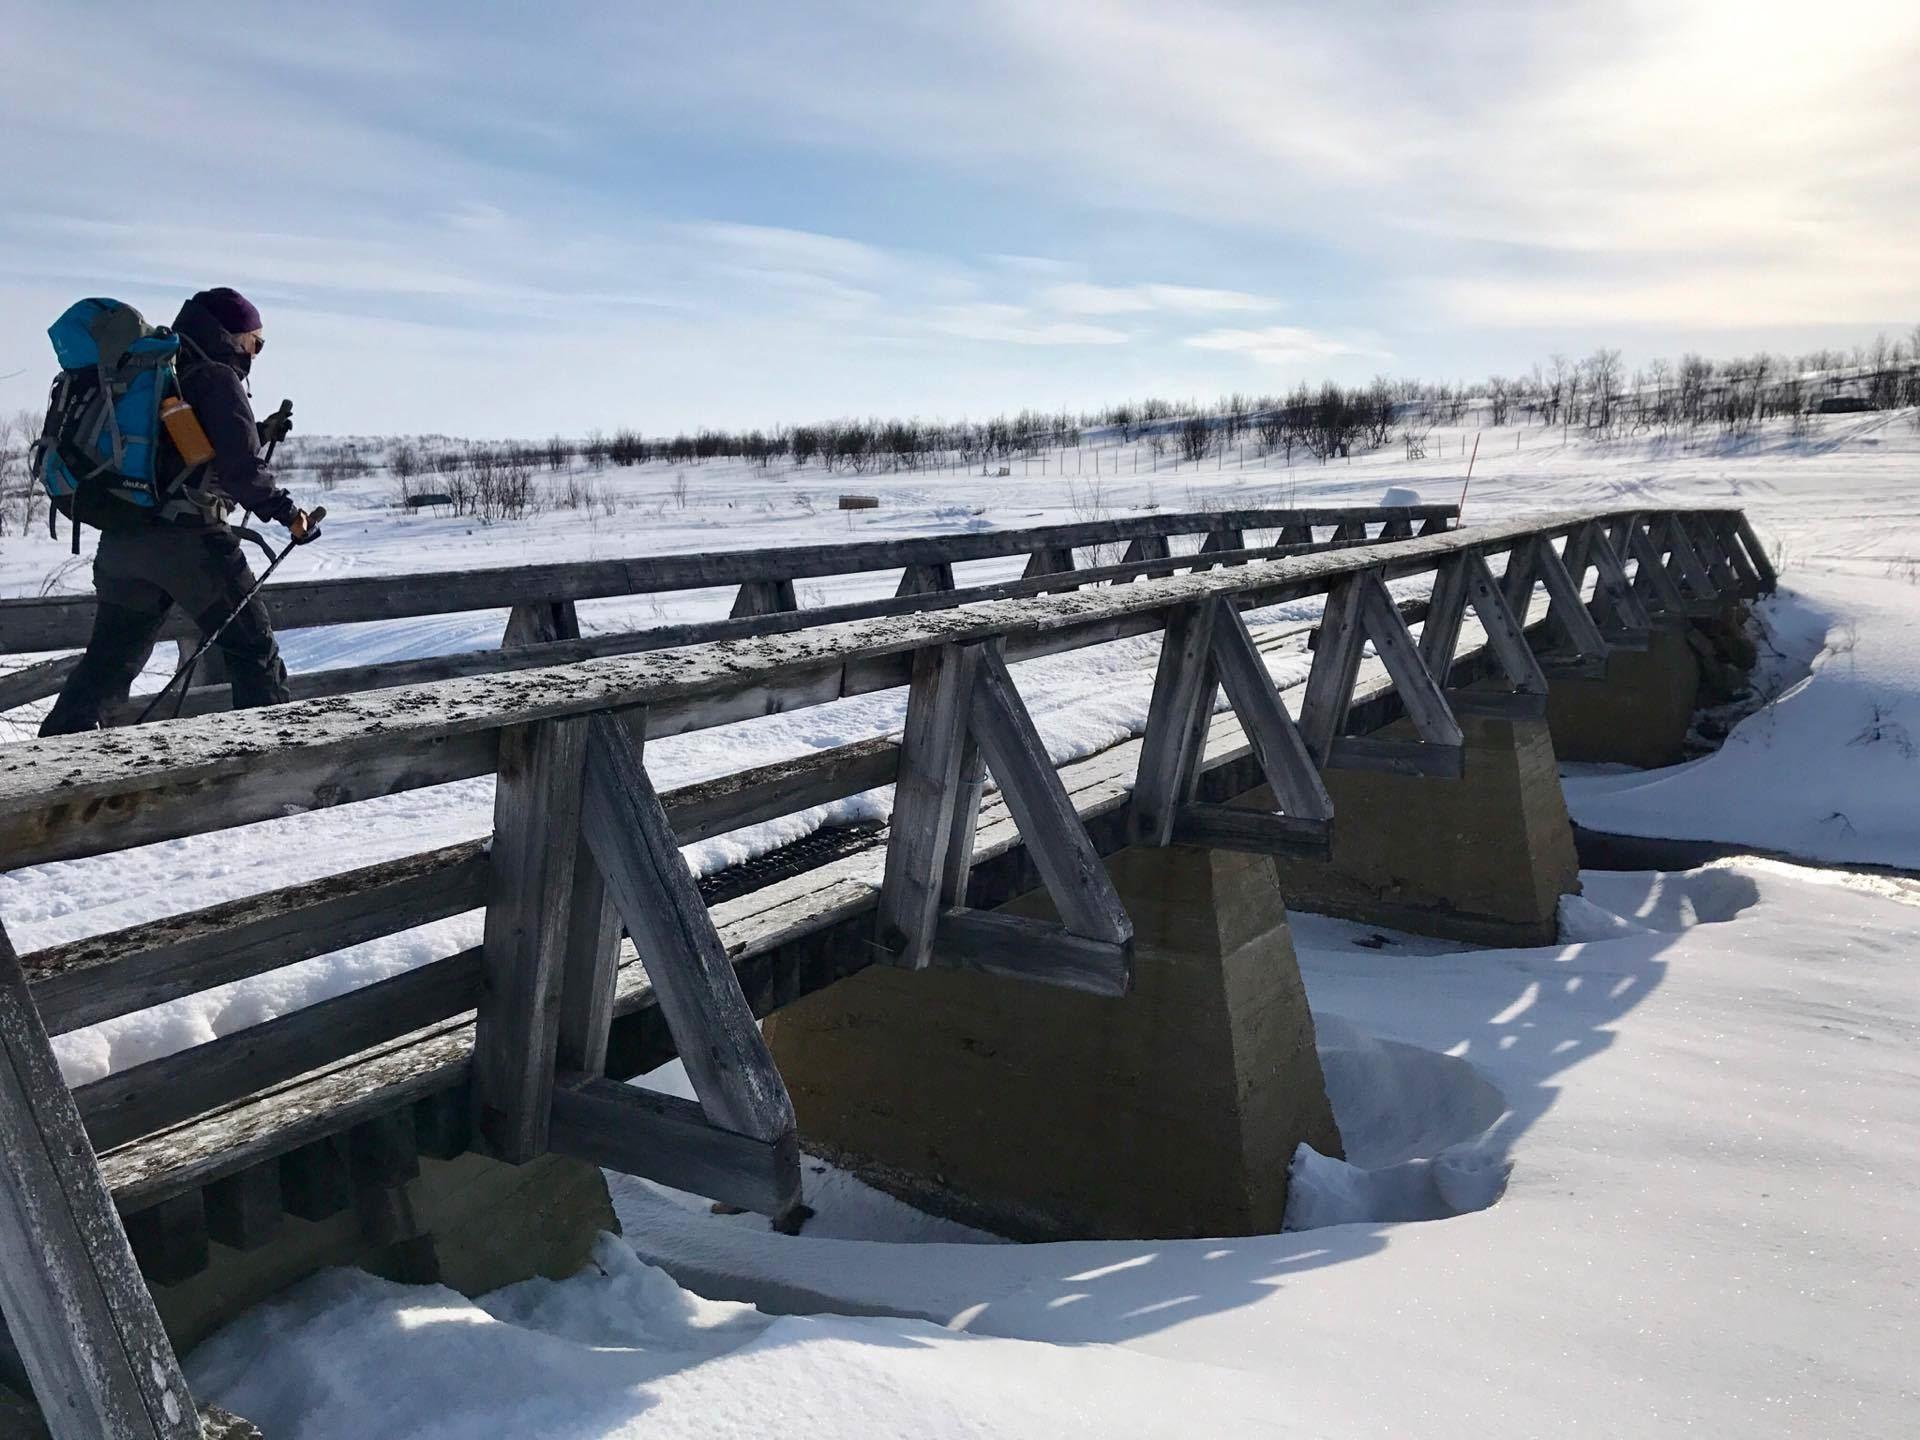 THE FINNMARK PLATEAU SKI EXPEDITION